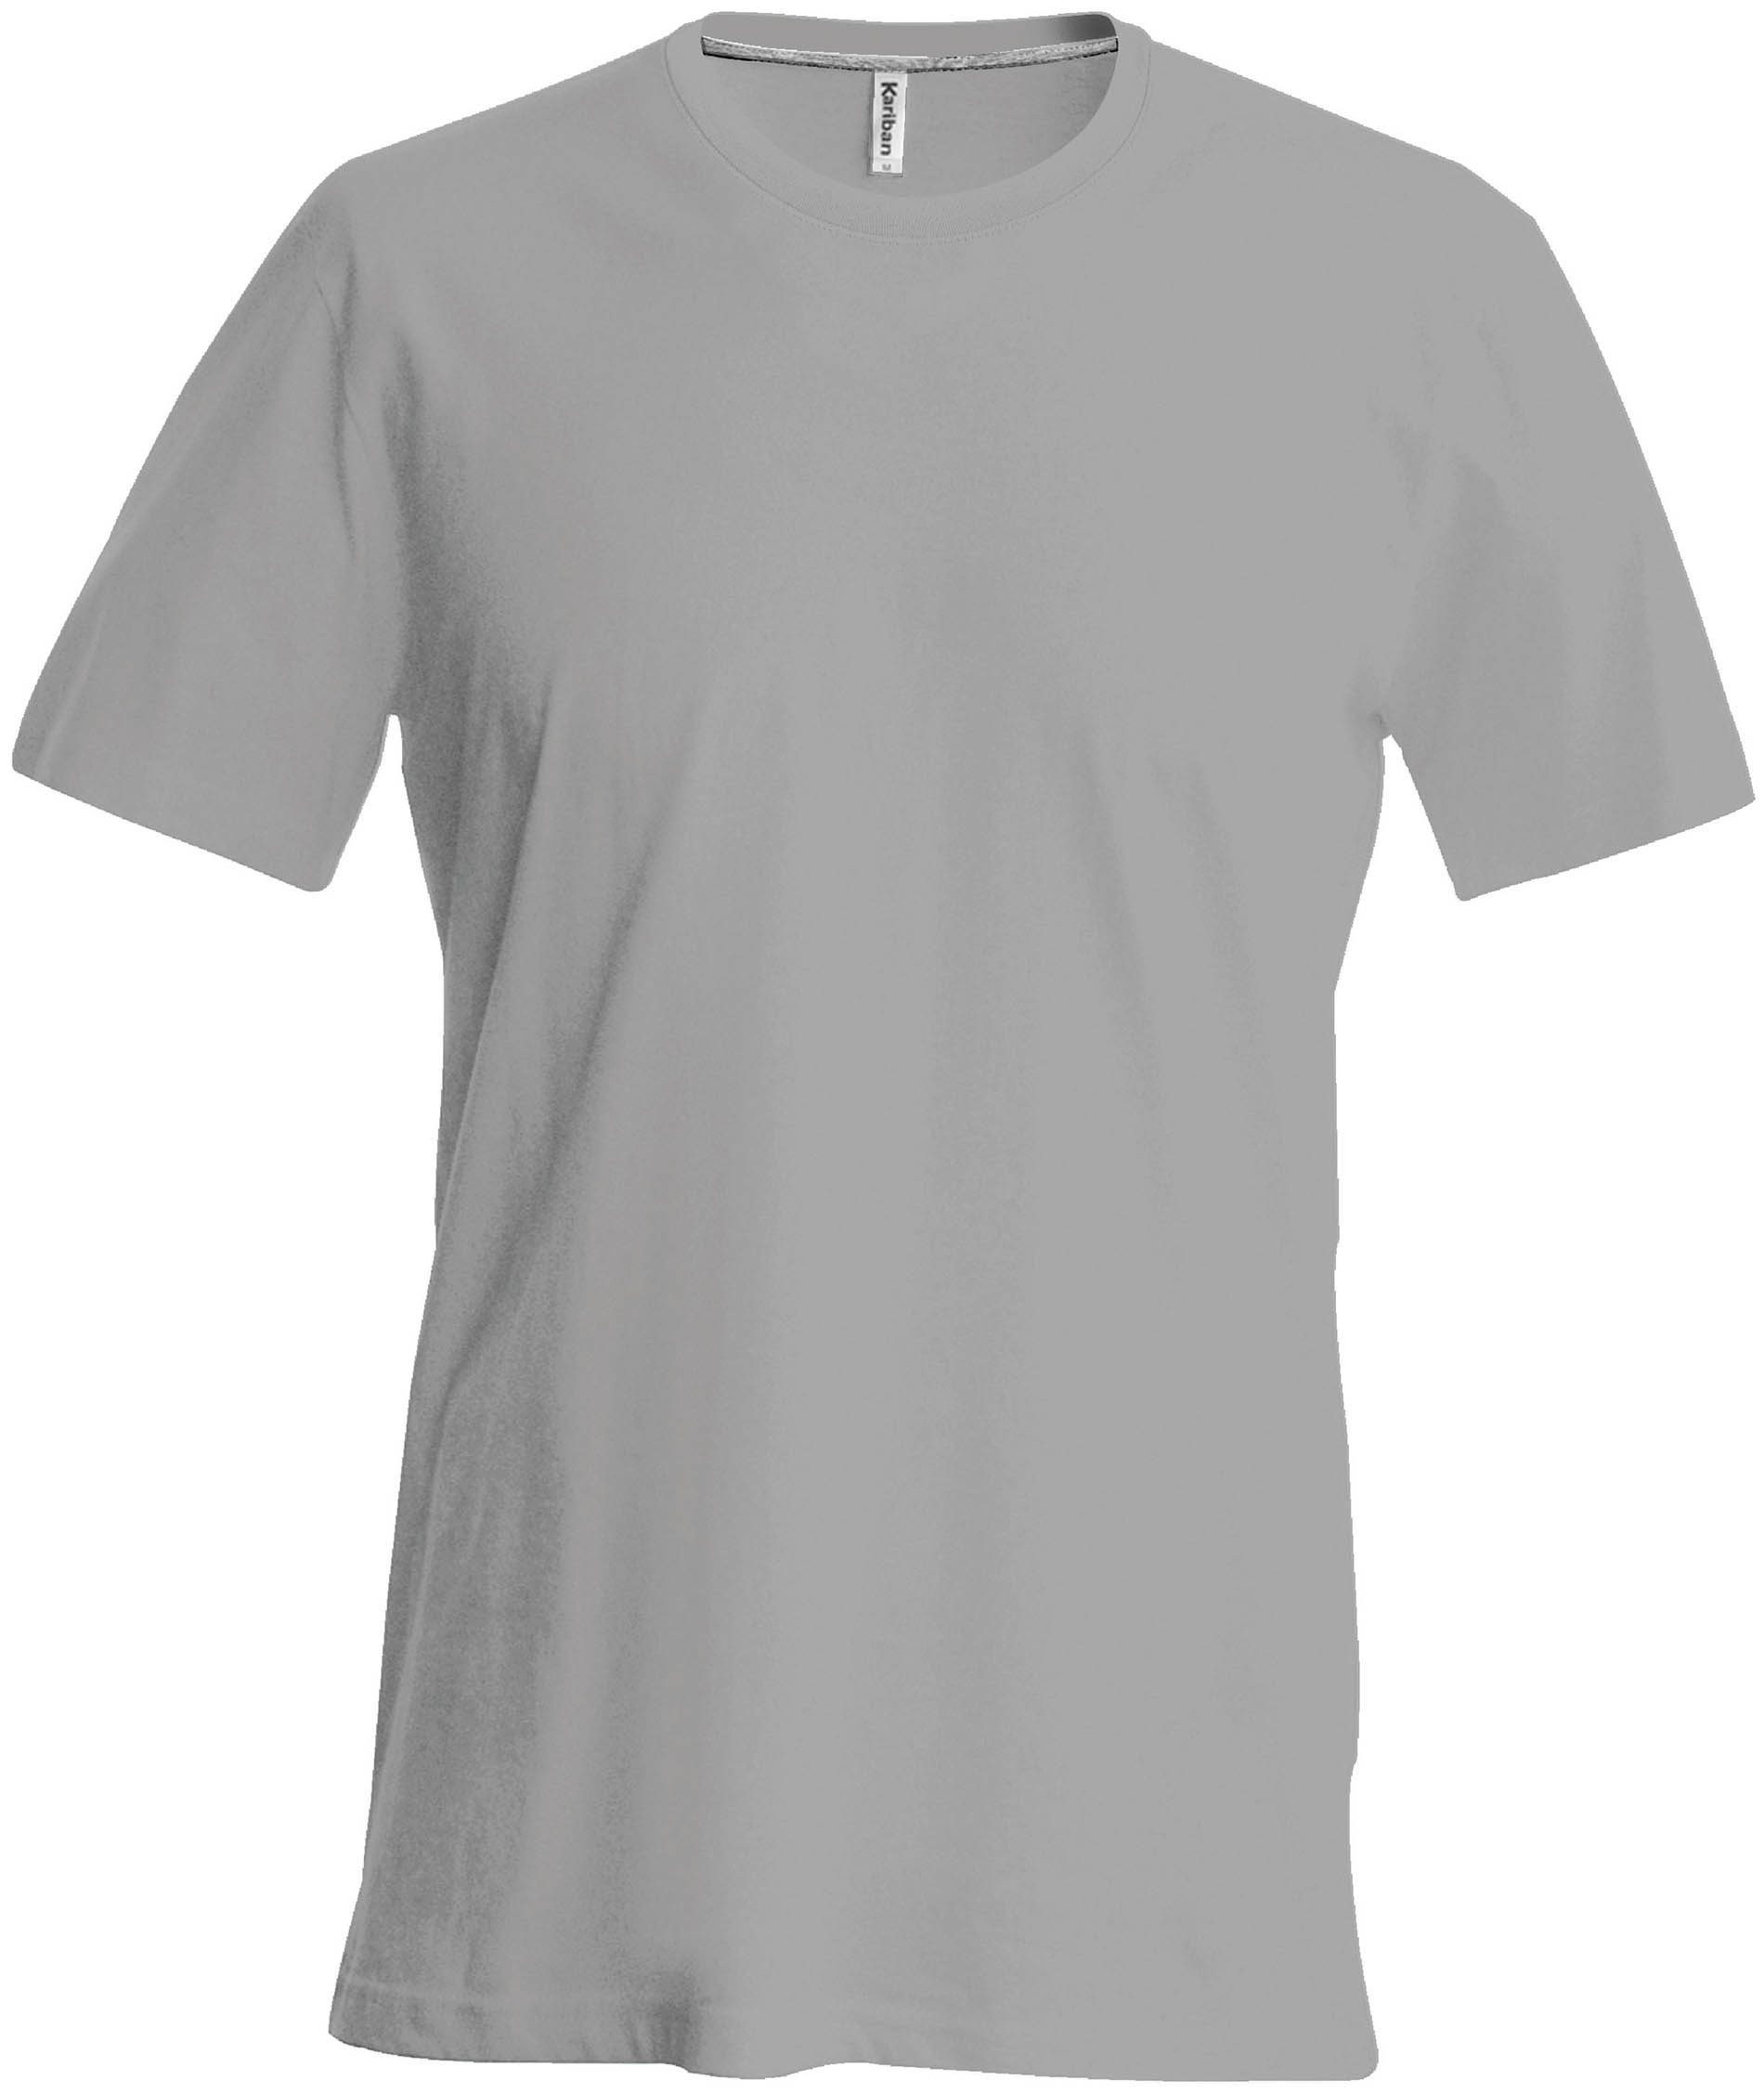 T-paita K356 Oxford Grey